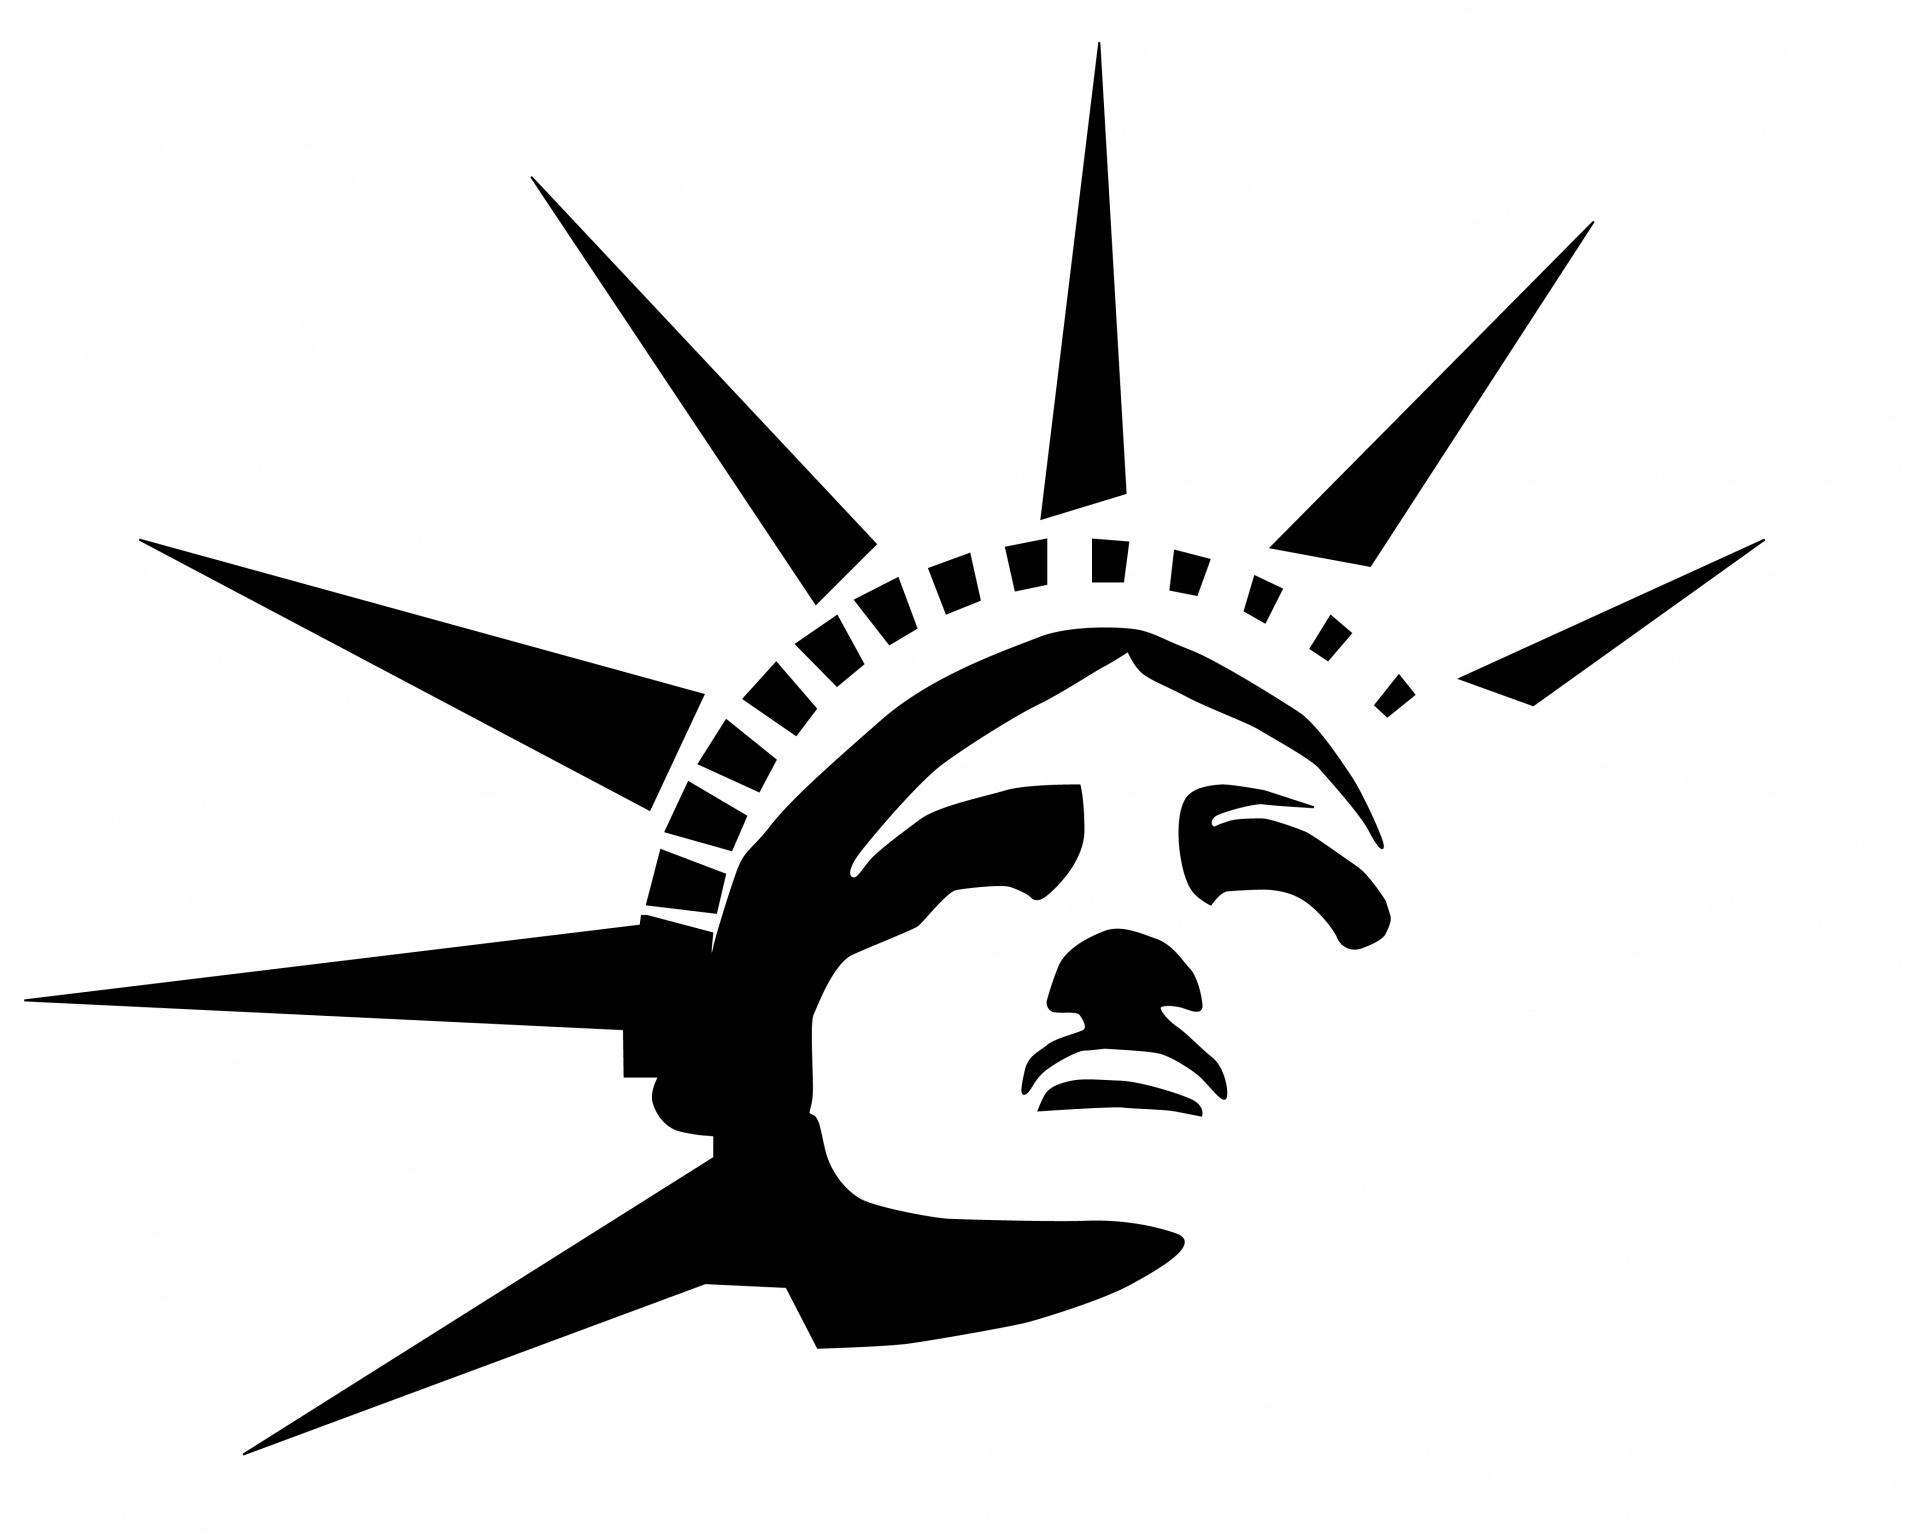 Statue of liberty Logos.